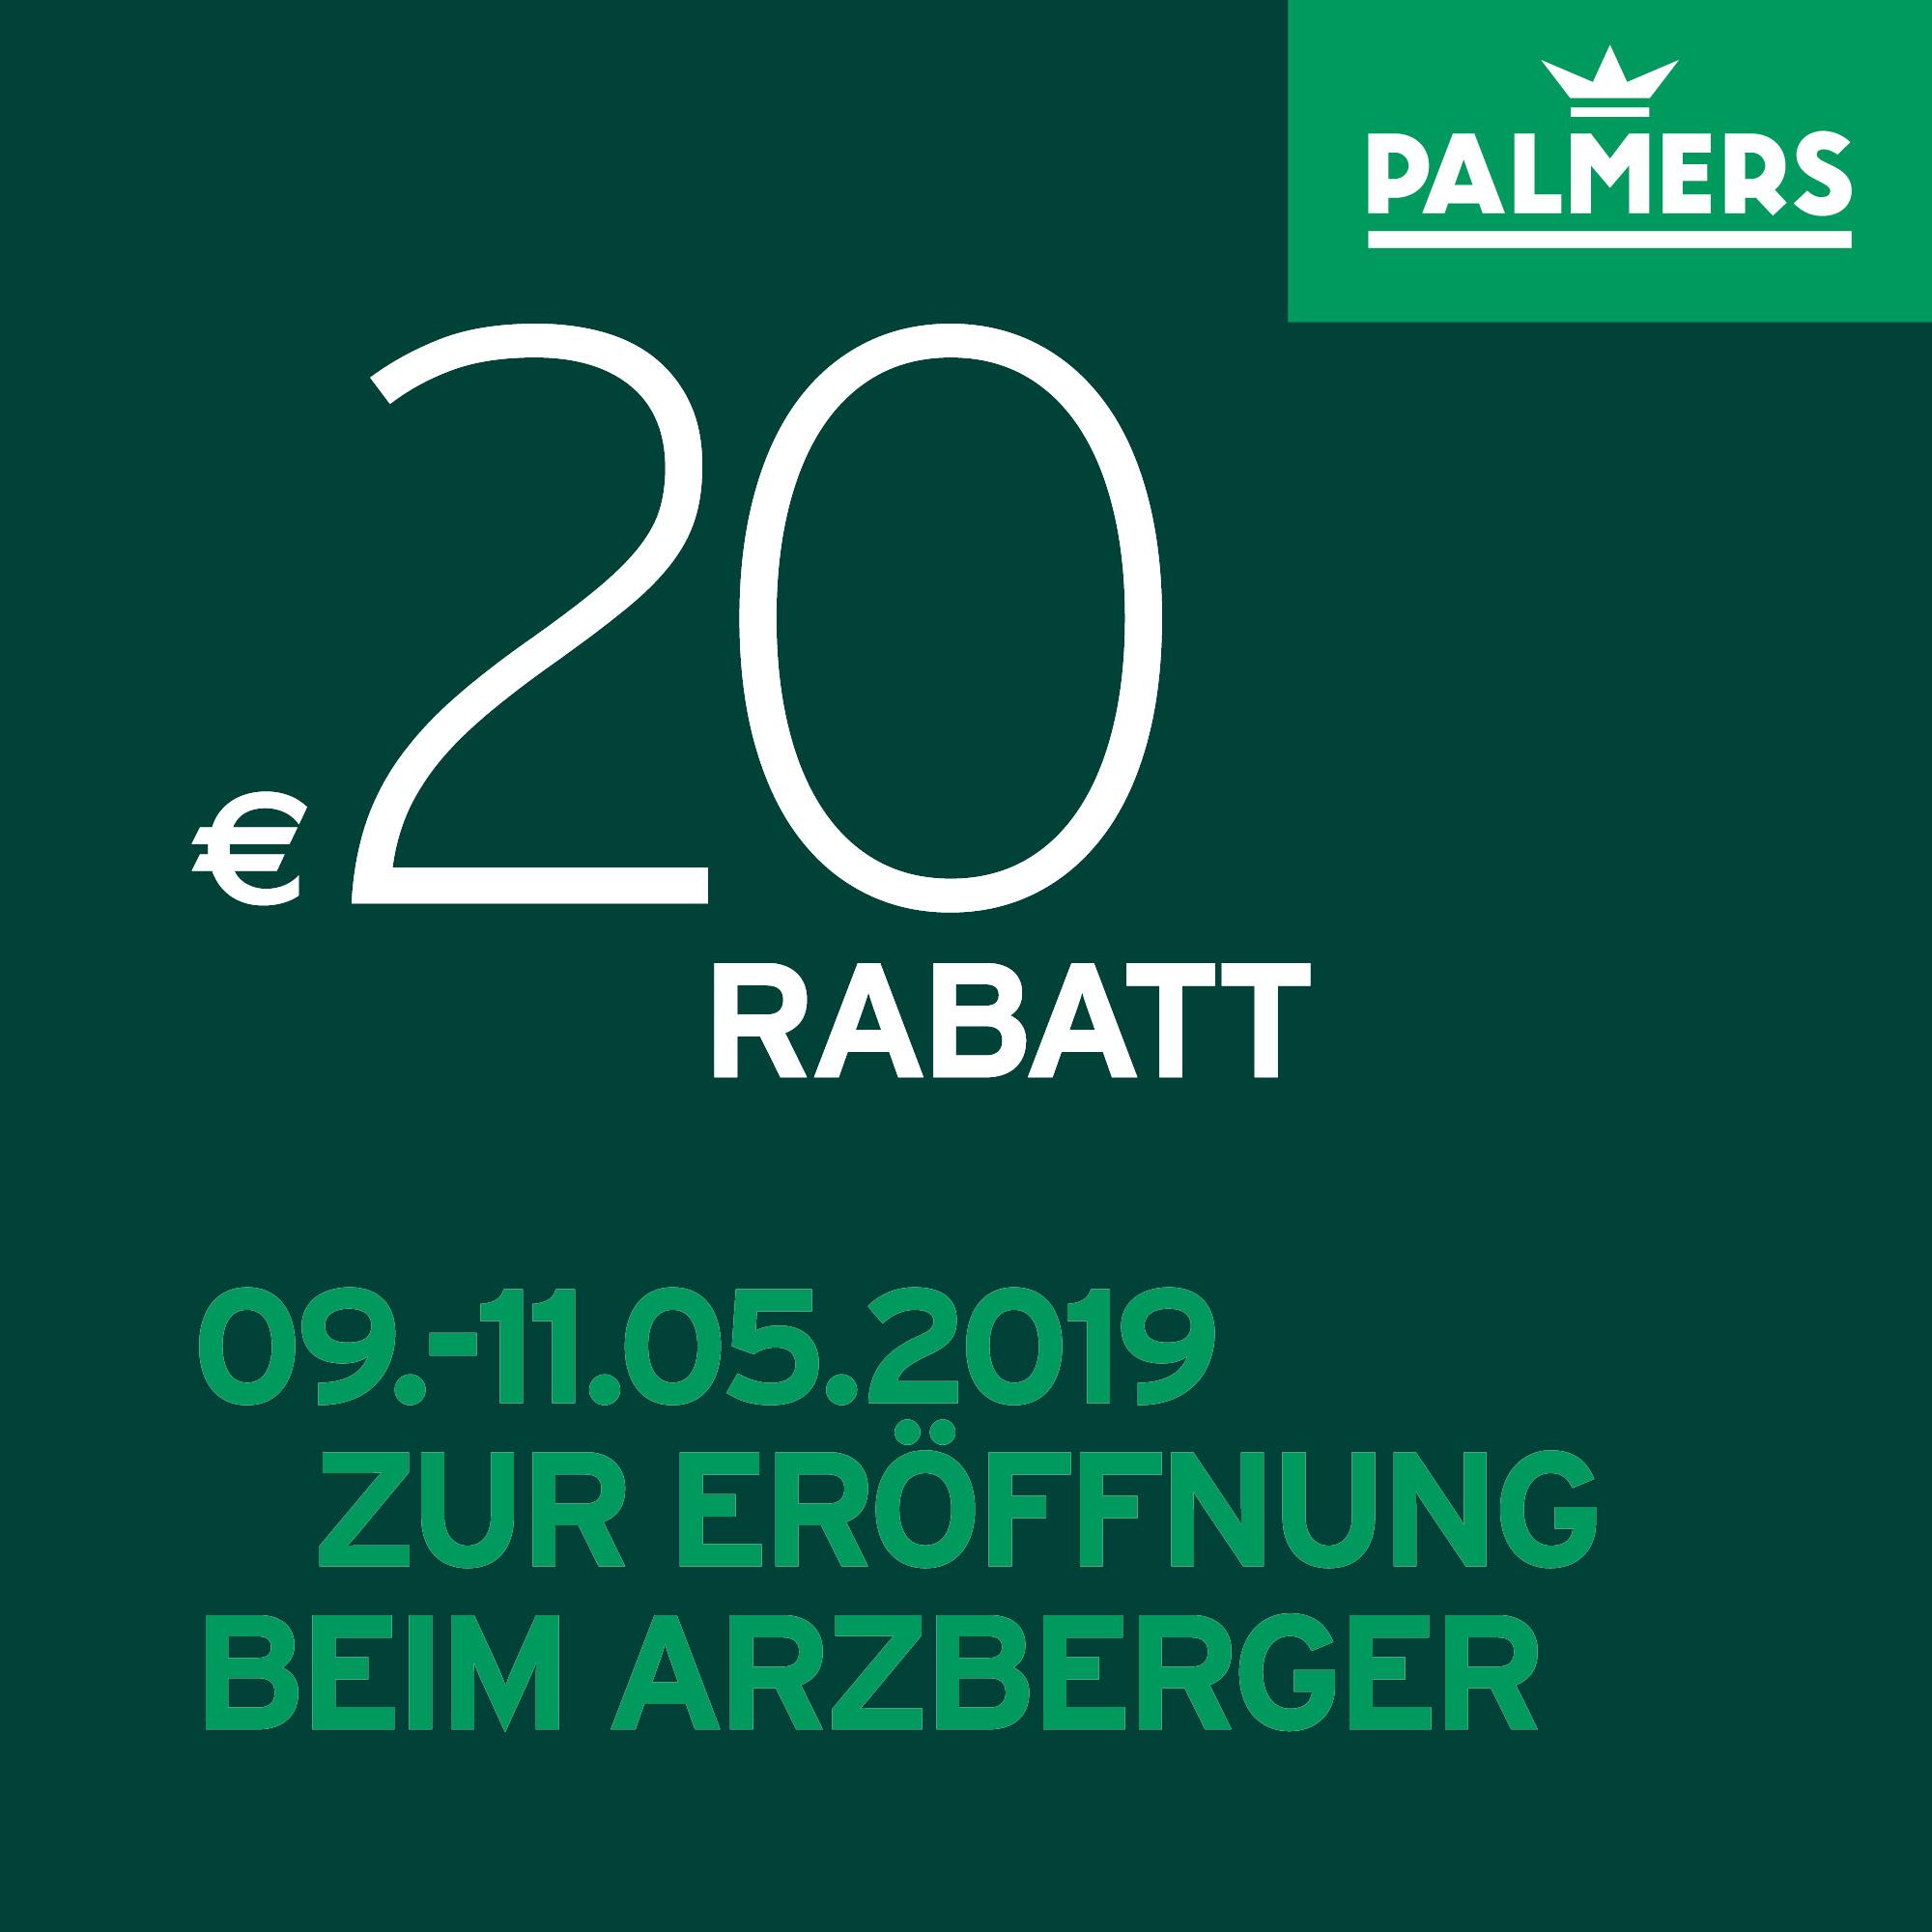 ARZ_FB_Palmers_2019_Bild_1